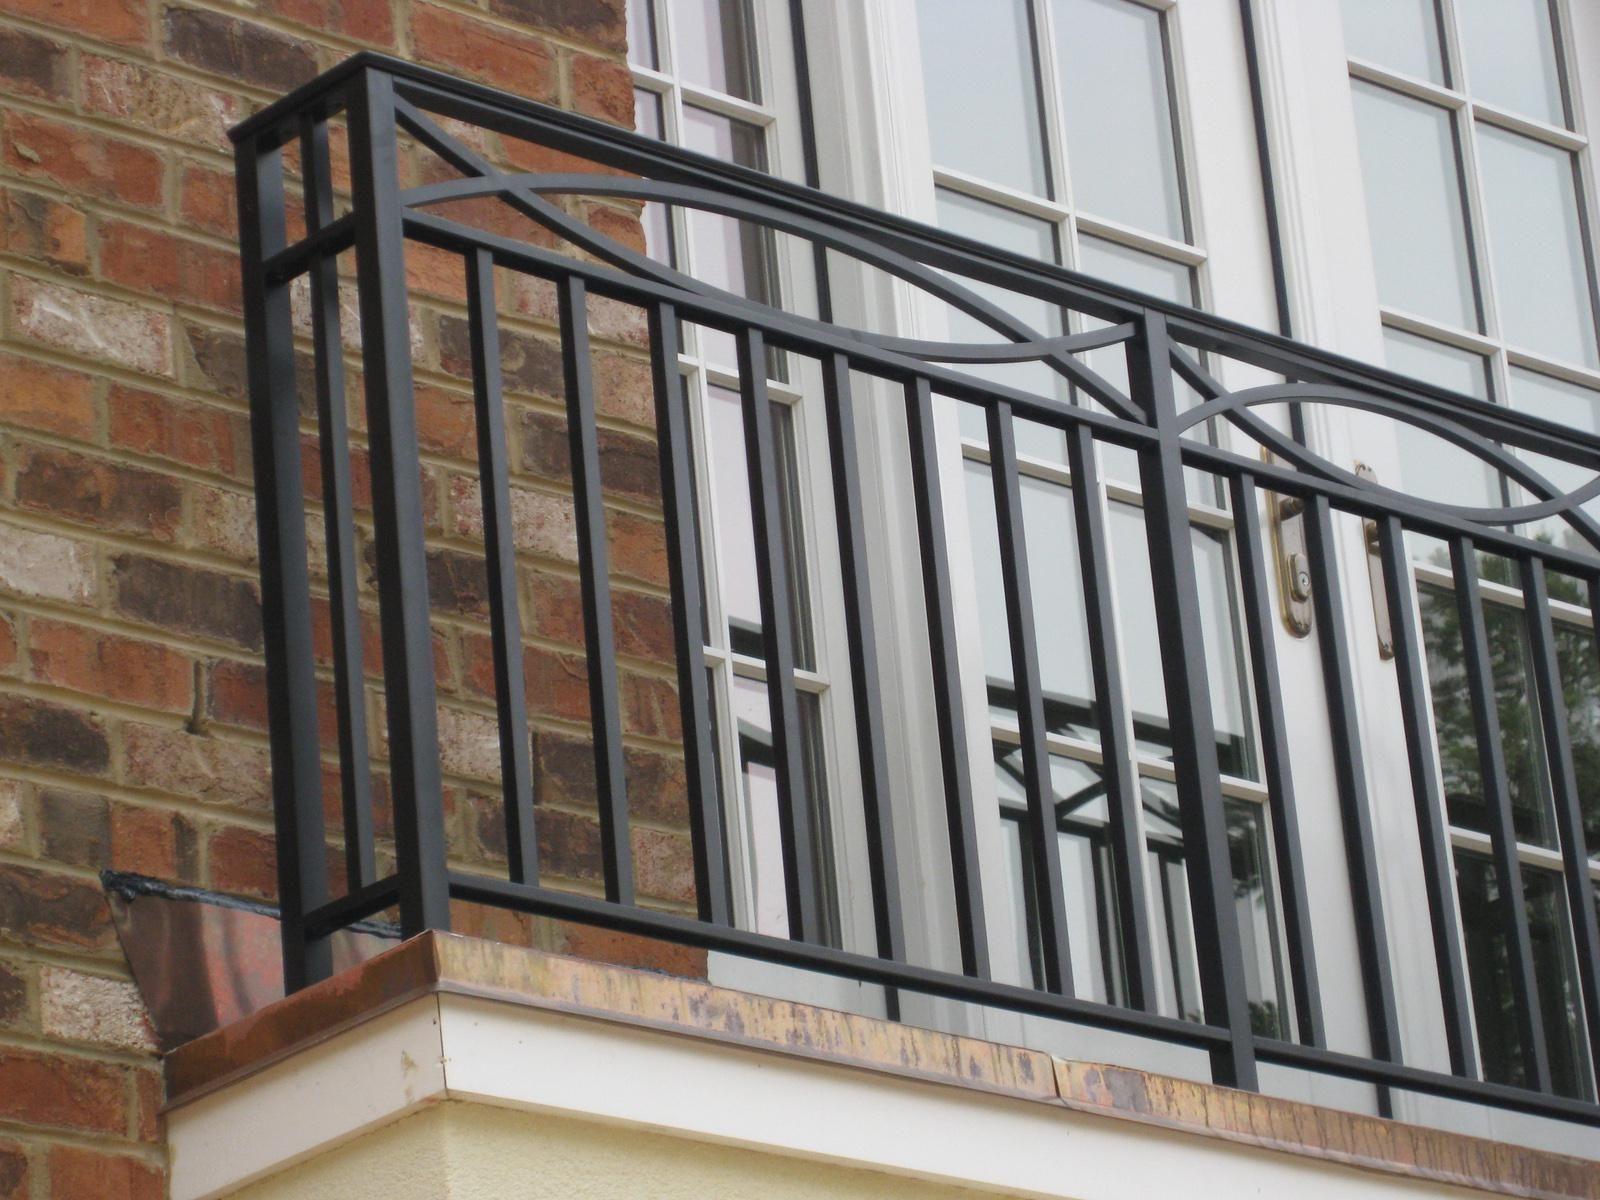 Wrought iron balcony railing buy wrought iron balcony railingoutdoor iron railingsmetal balcony railing product on alibaba com balcony railing